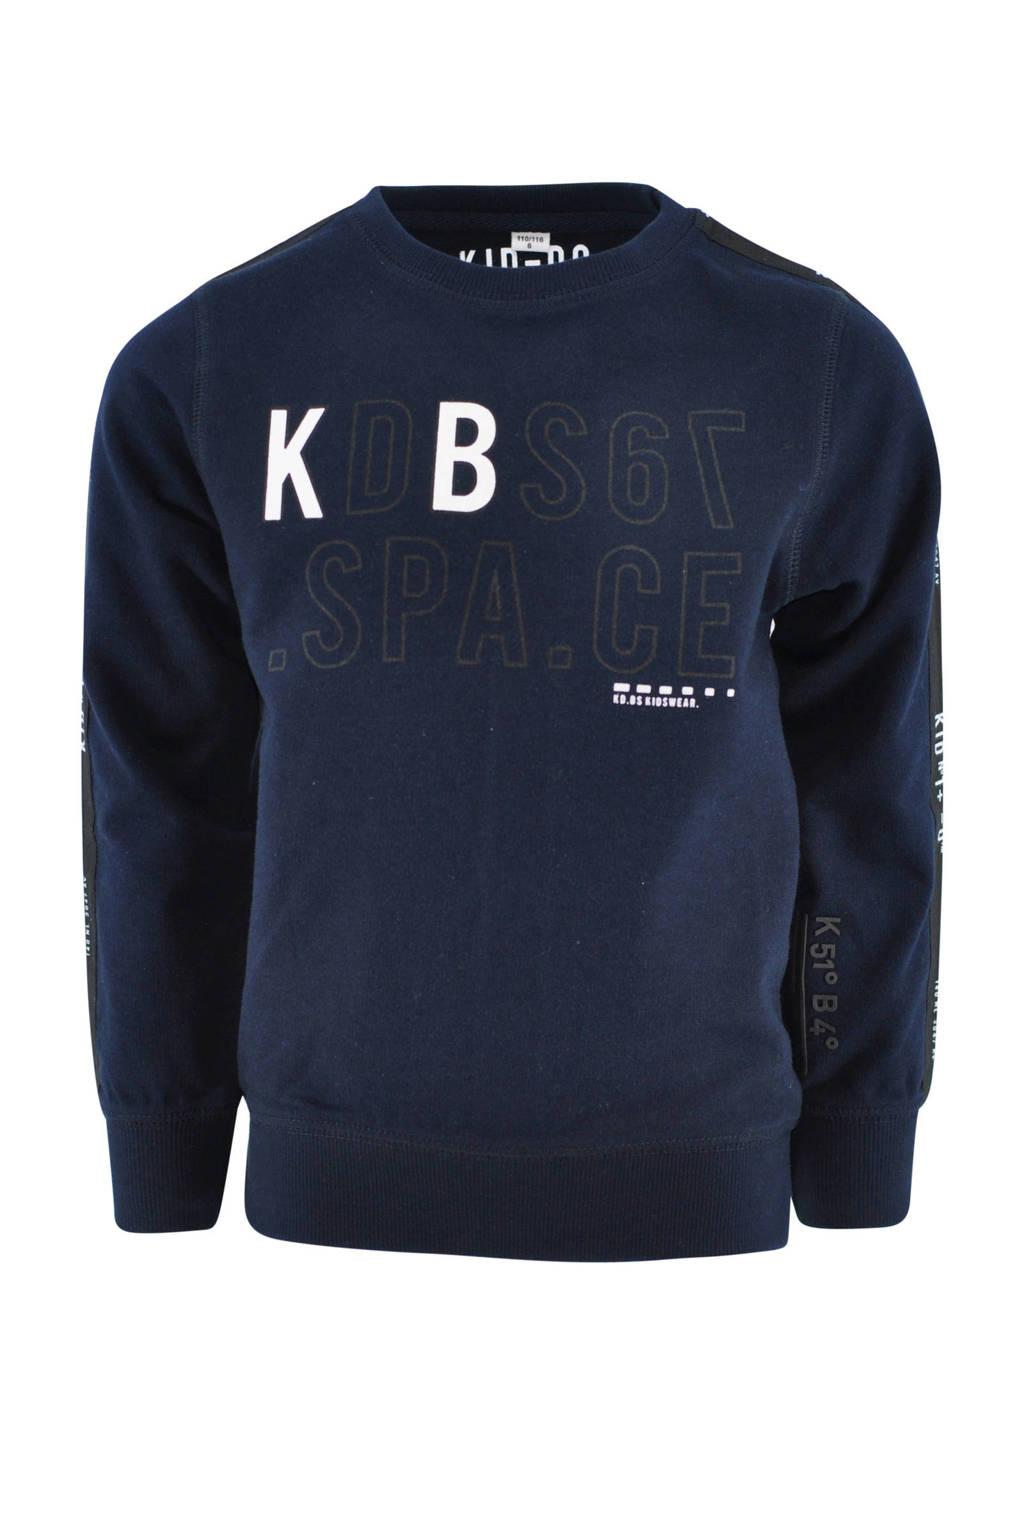 KIDDO sweater Oscar met tekst donkerblauw, Donkerblauw